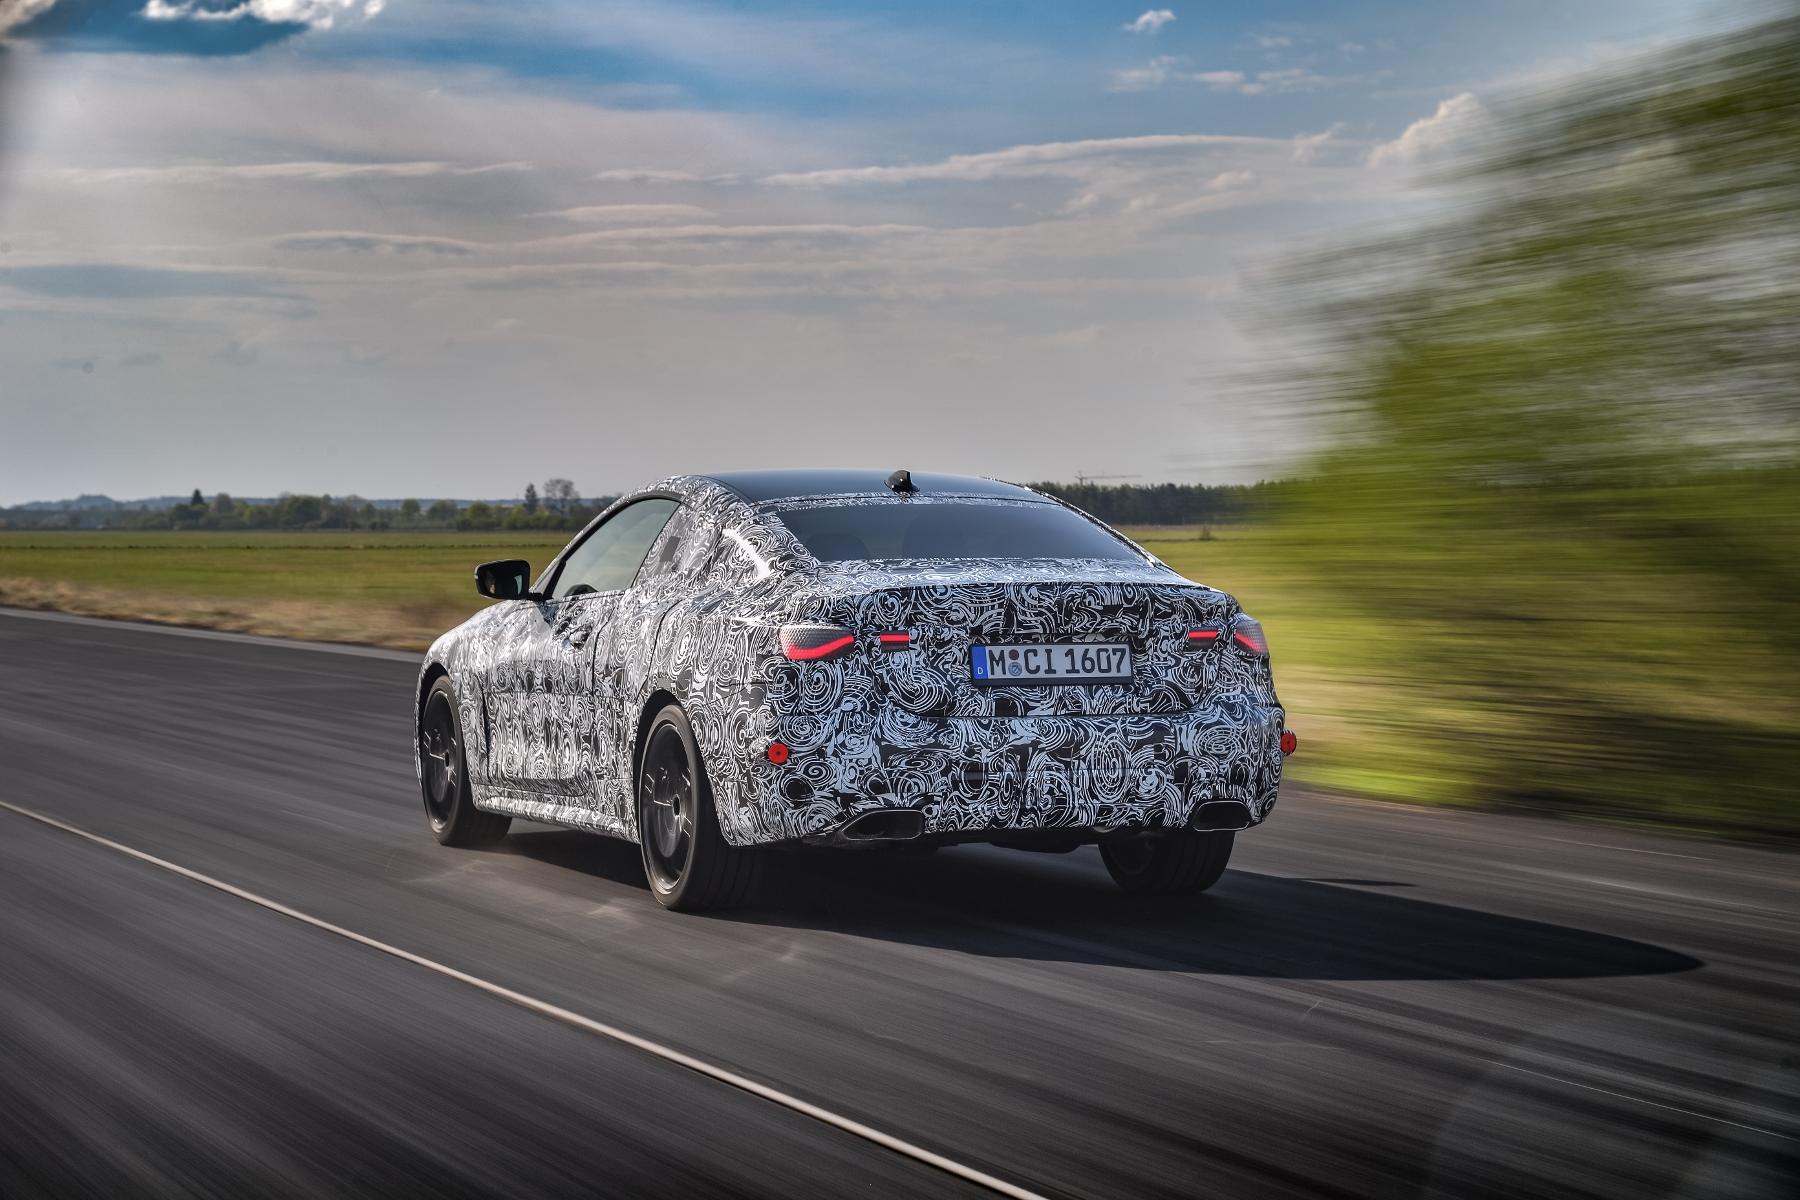 Nové BMW radu 4 Coupé dostane športovejší podvozok S9aEnySKGW bmw-4-coupe-8